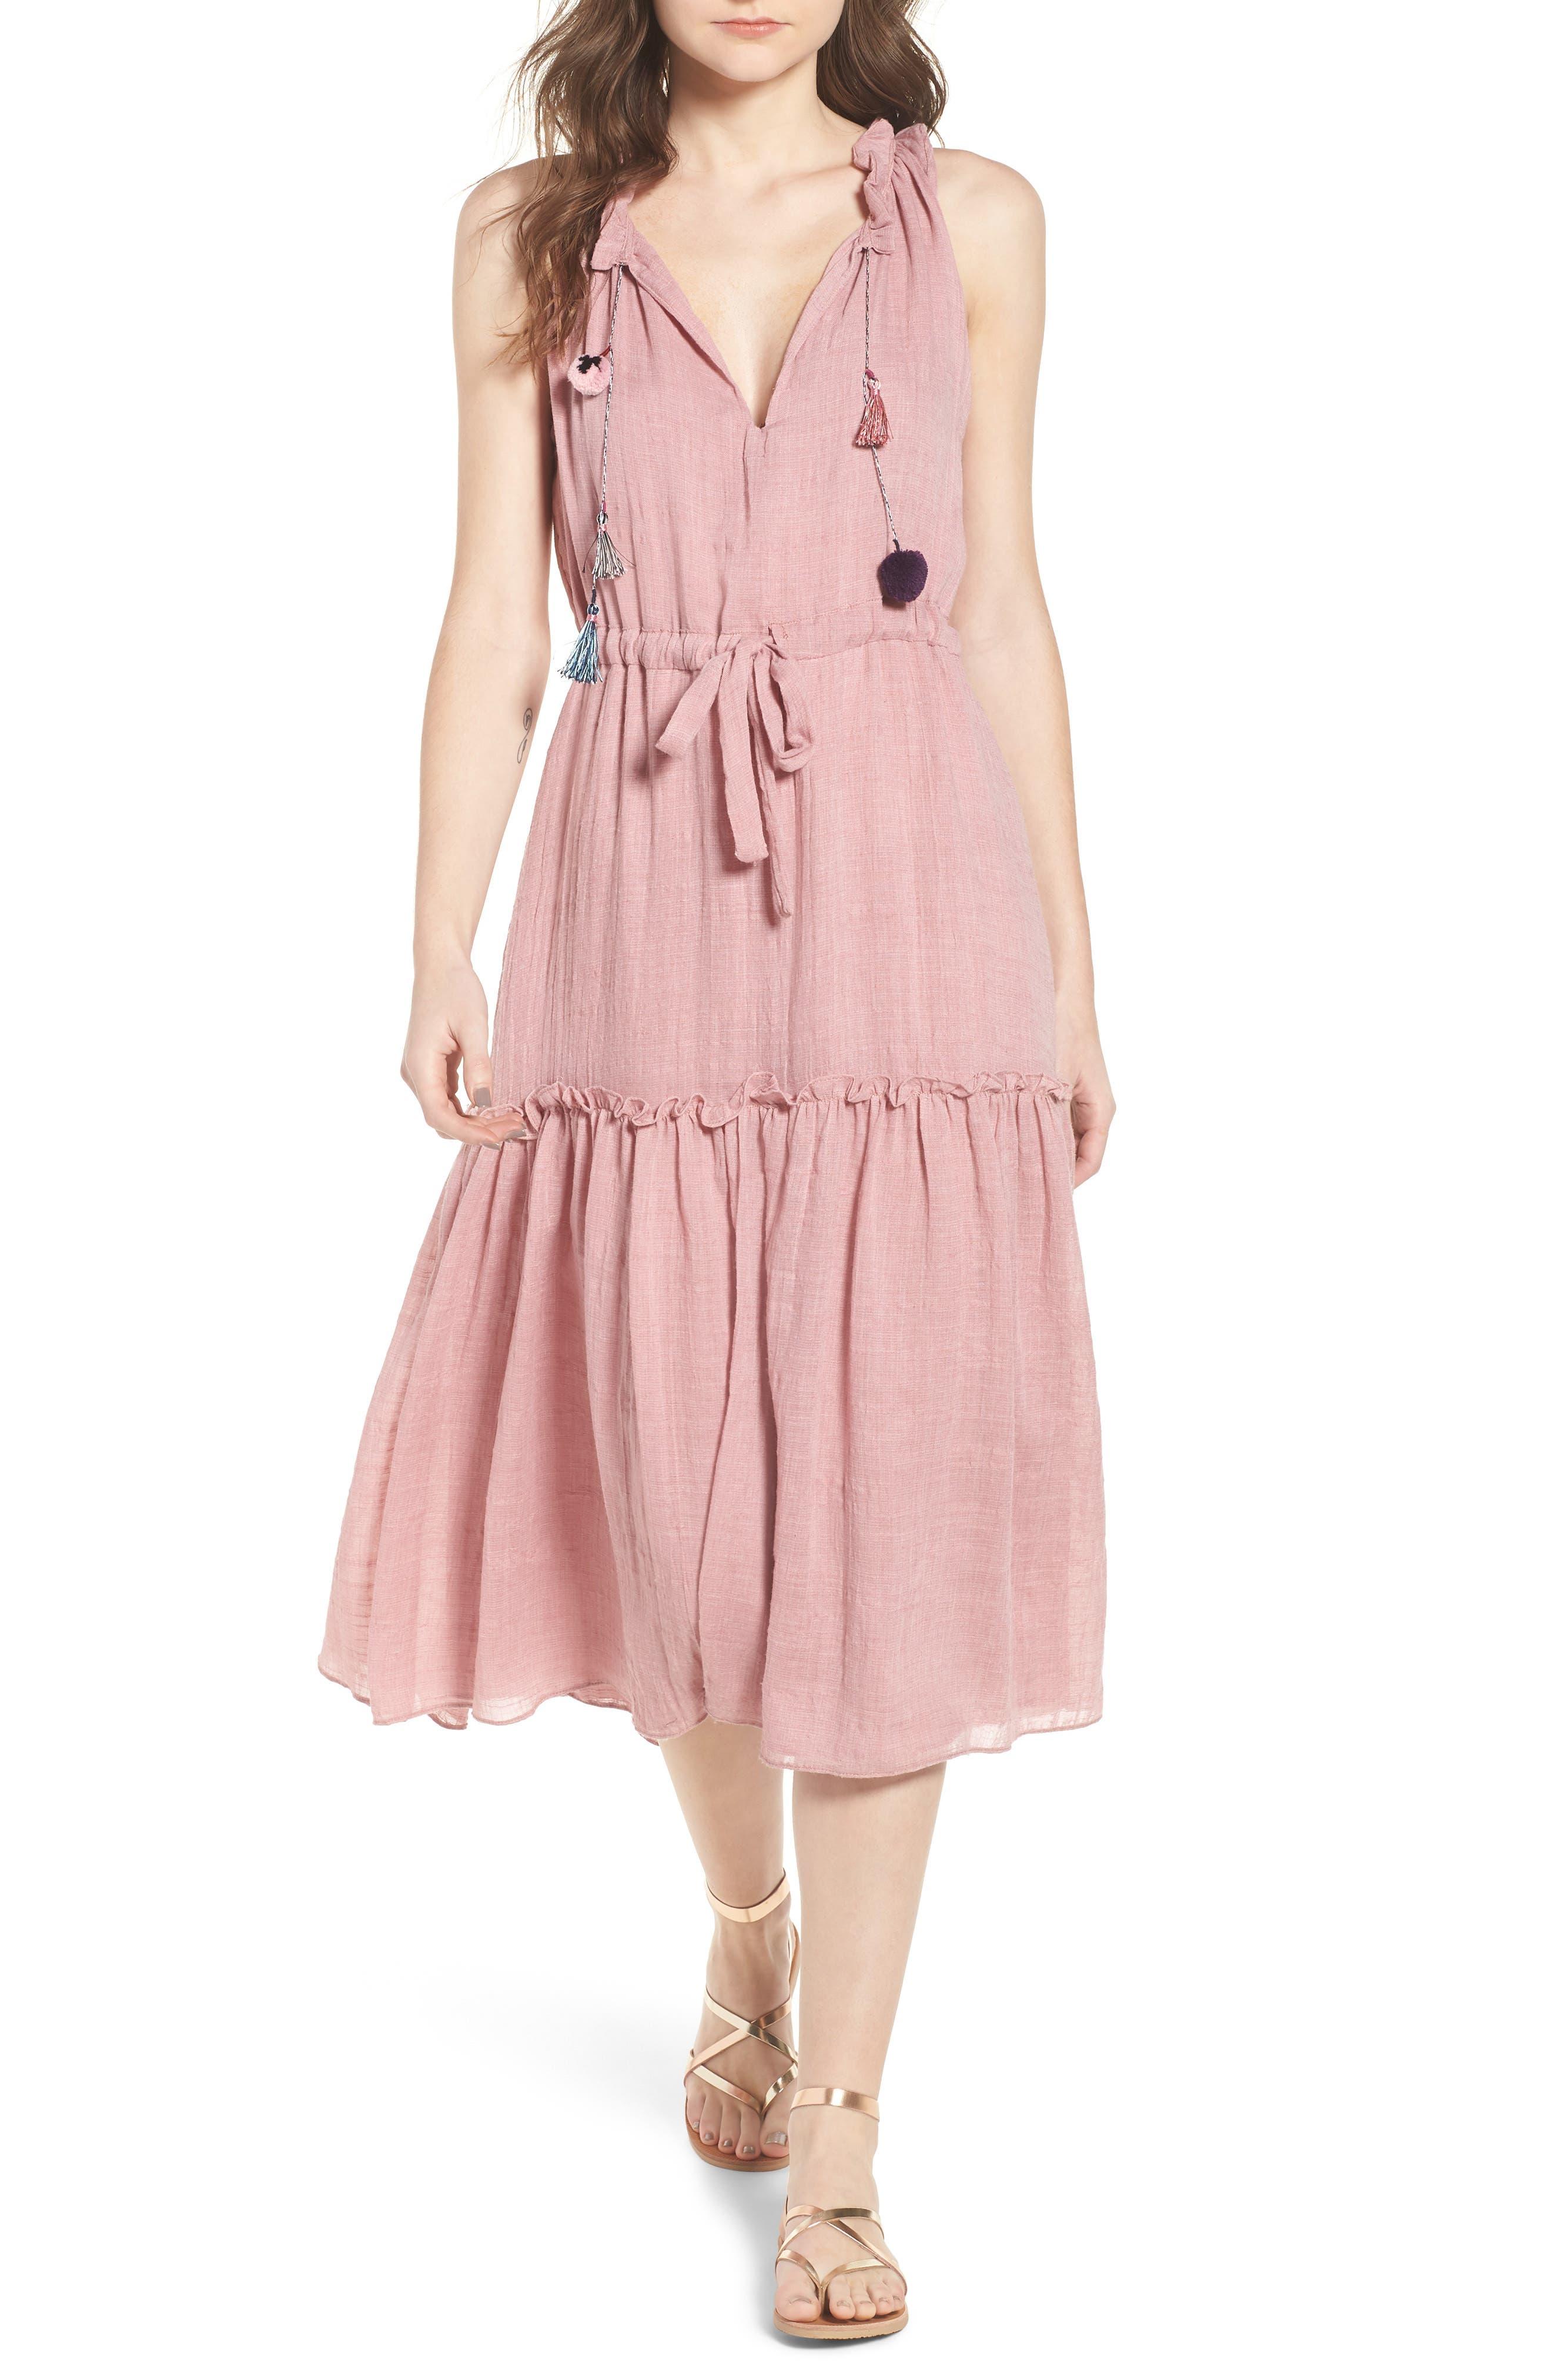 Nicolleta Tie Waist Midi Dress,                             Main thumbnail 1, color,                             650